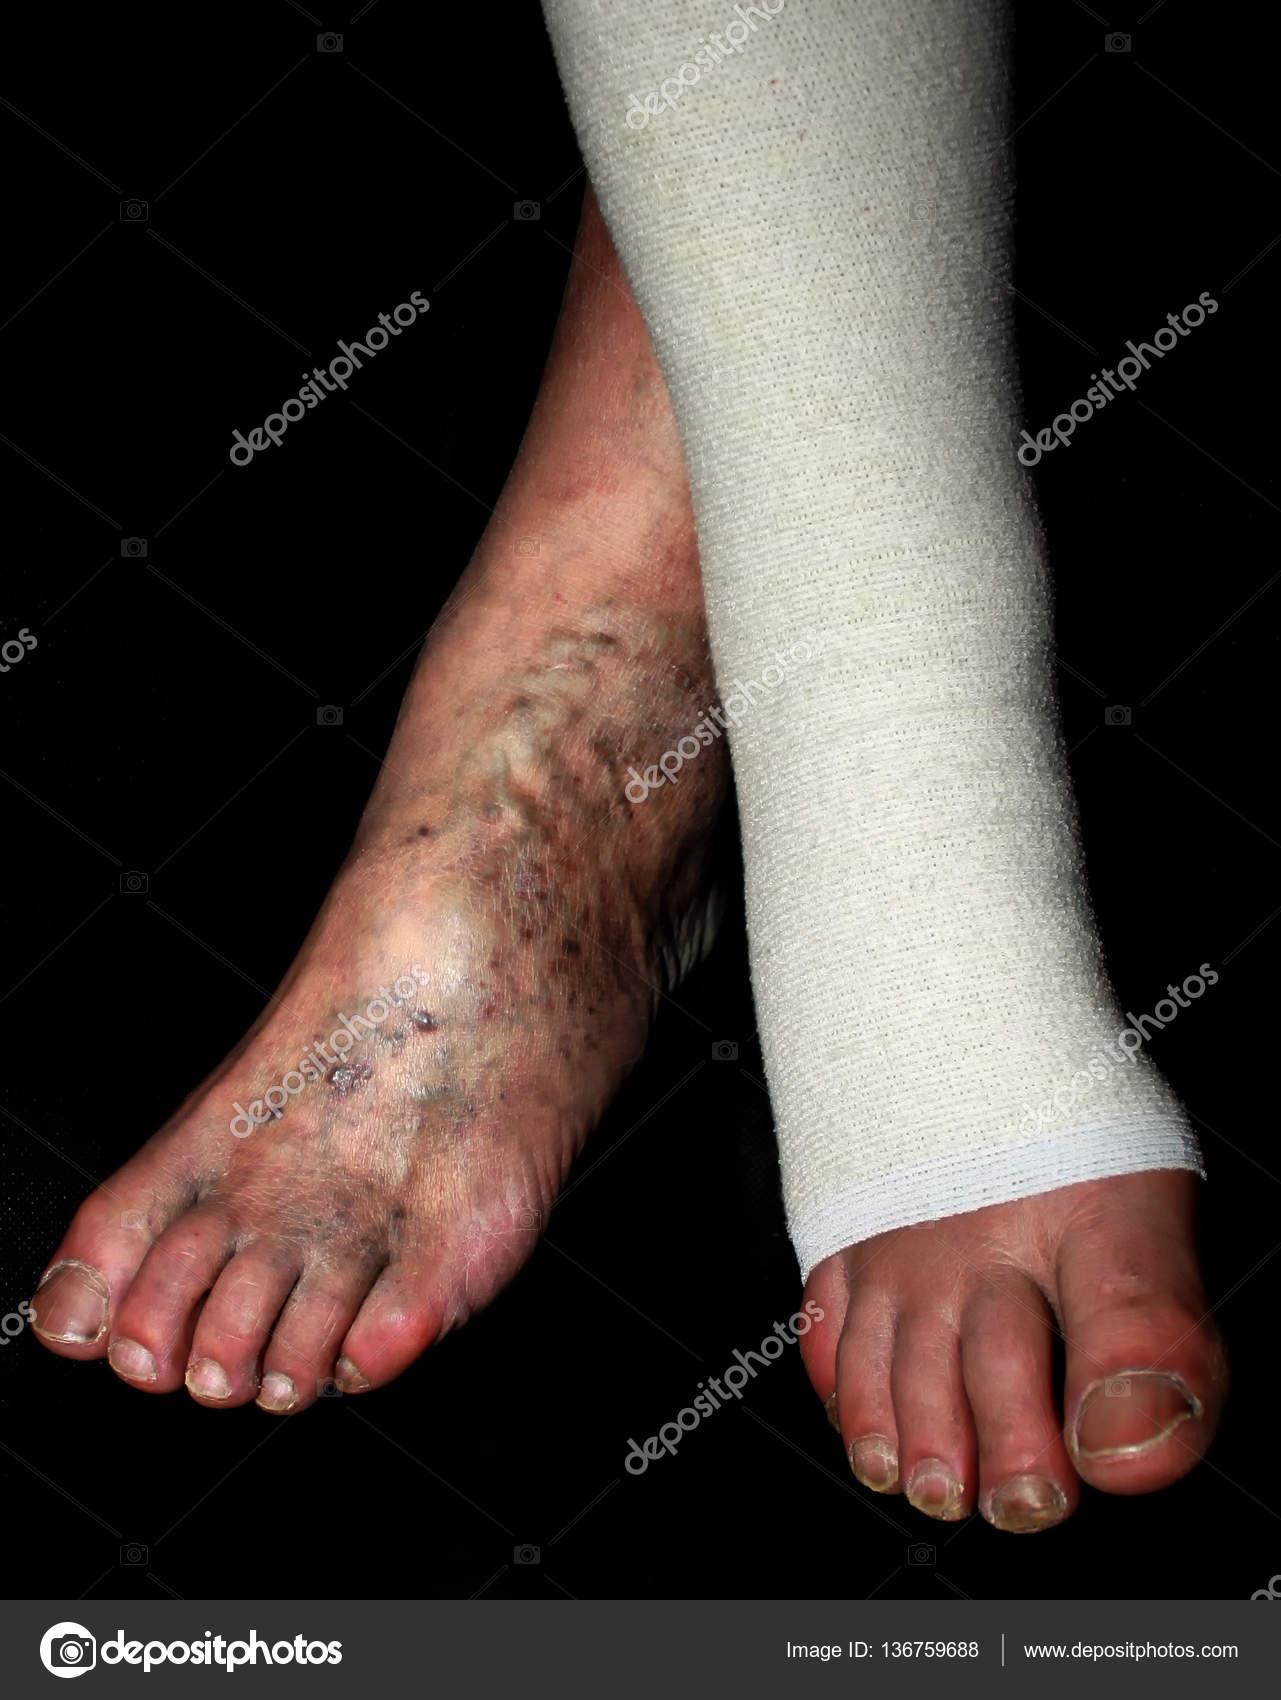 noga umflat în varicoză